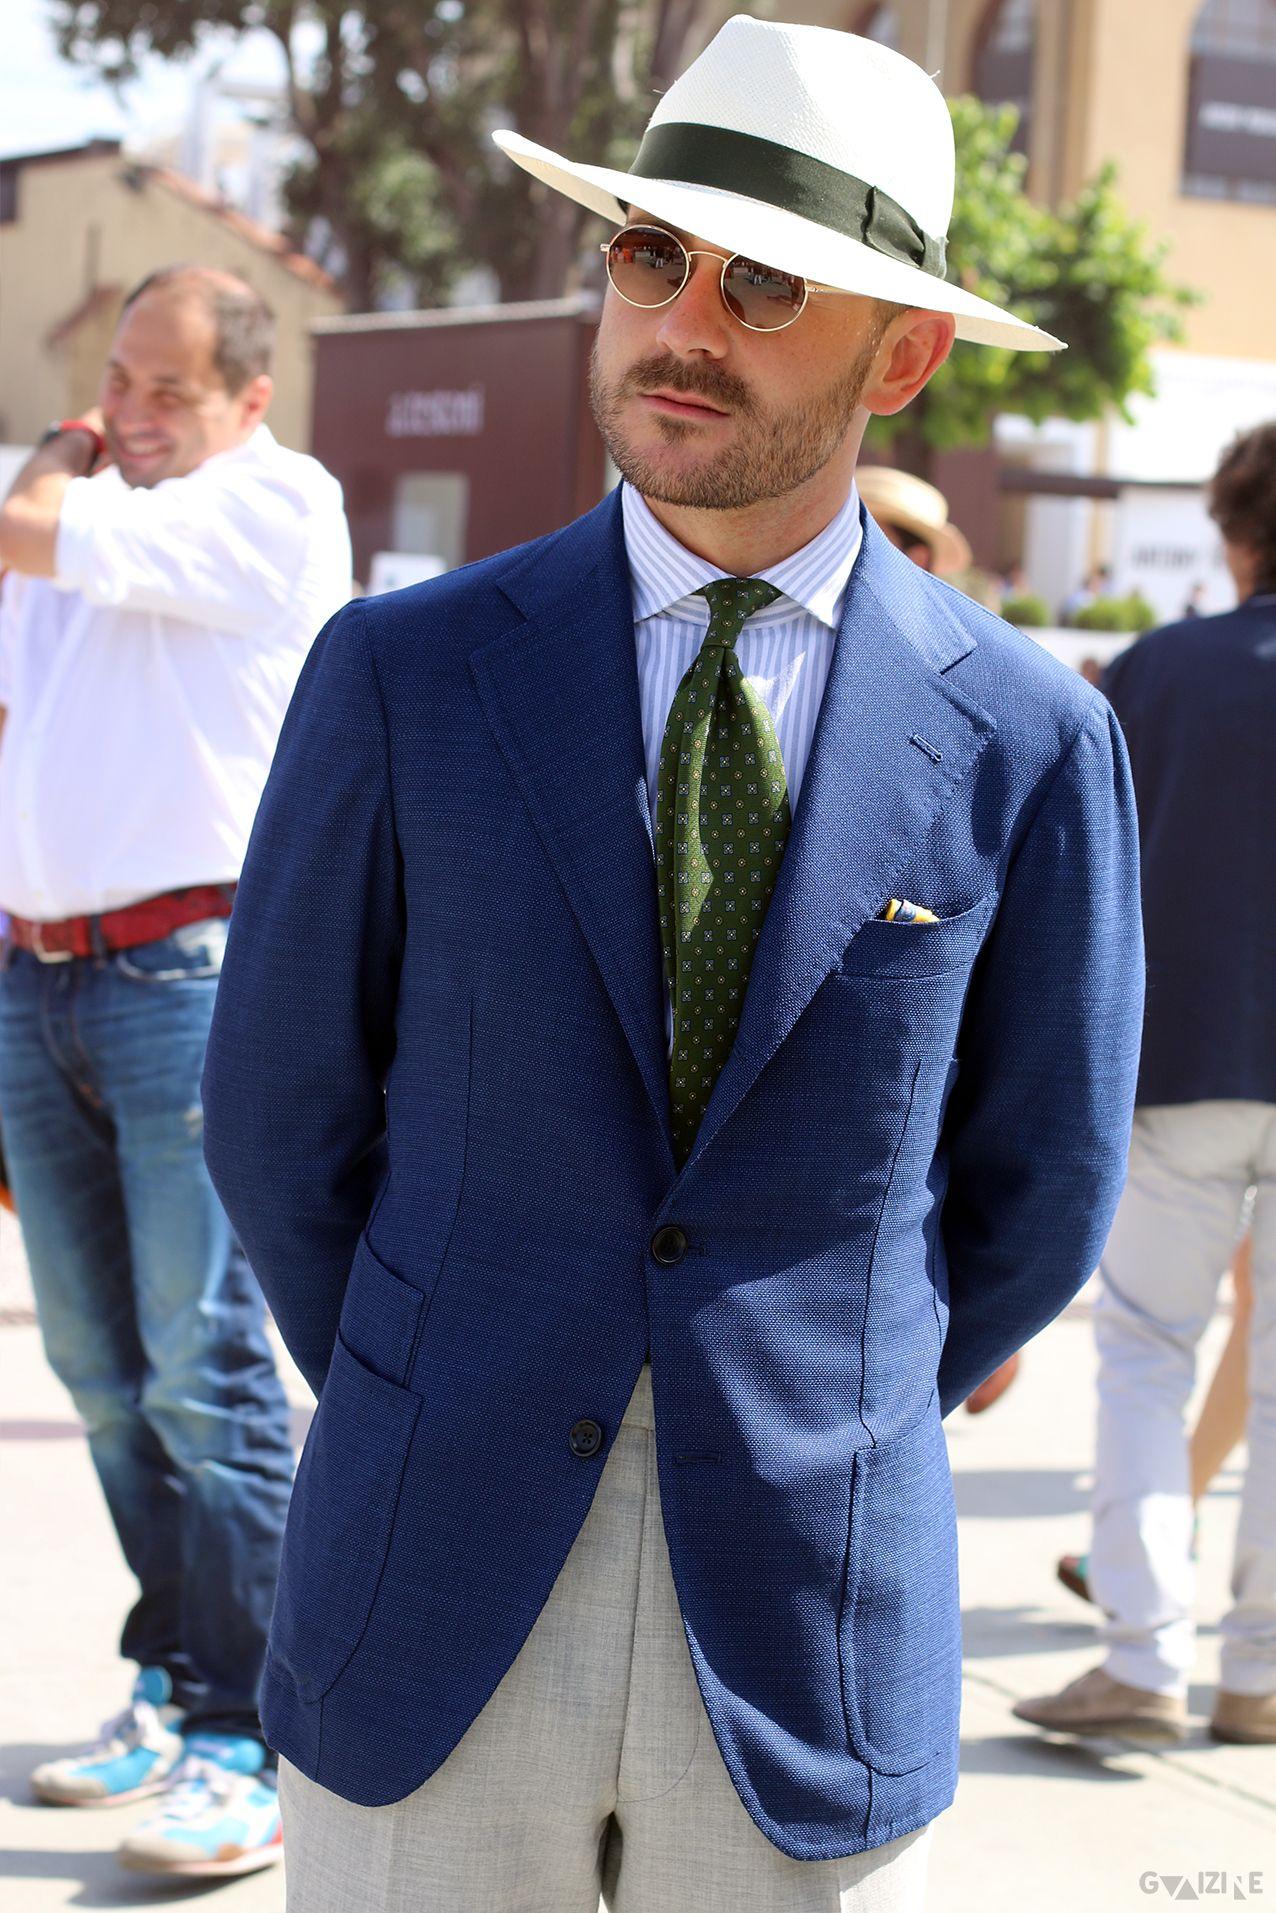 2e24b9139f70 Men's Hat Inspiration #2 Follow MenStyle1.com... | MenStyle1- Men's Style  Blog